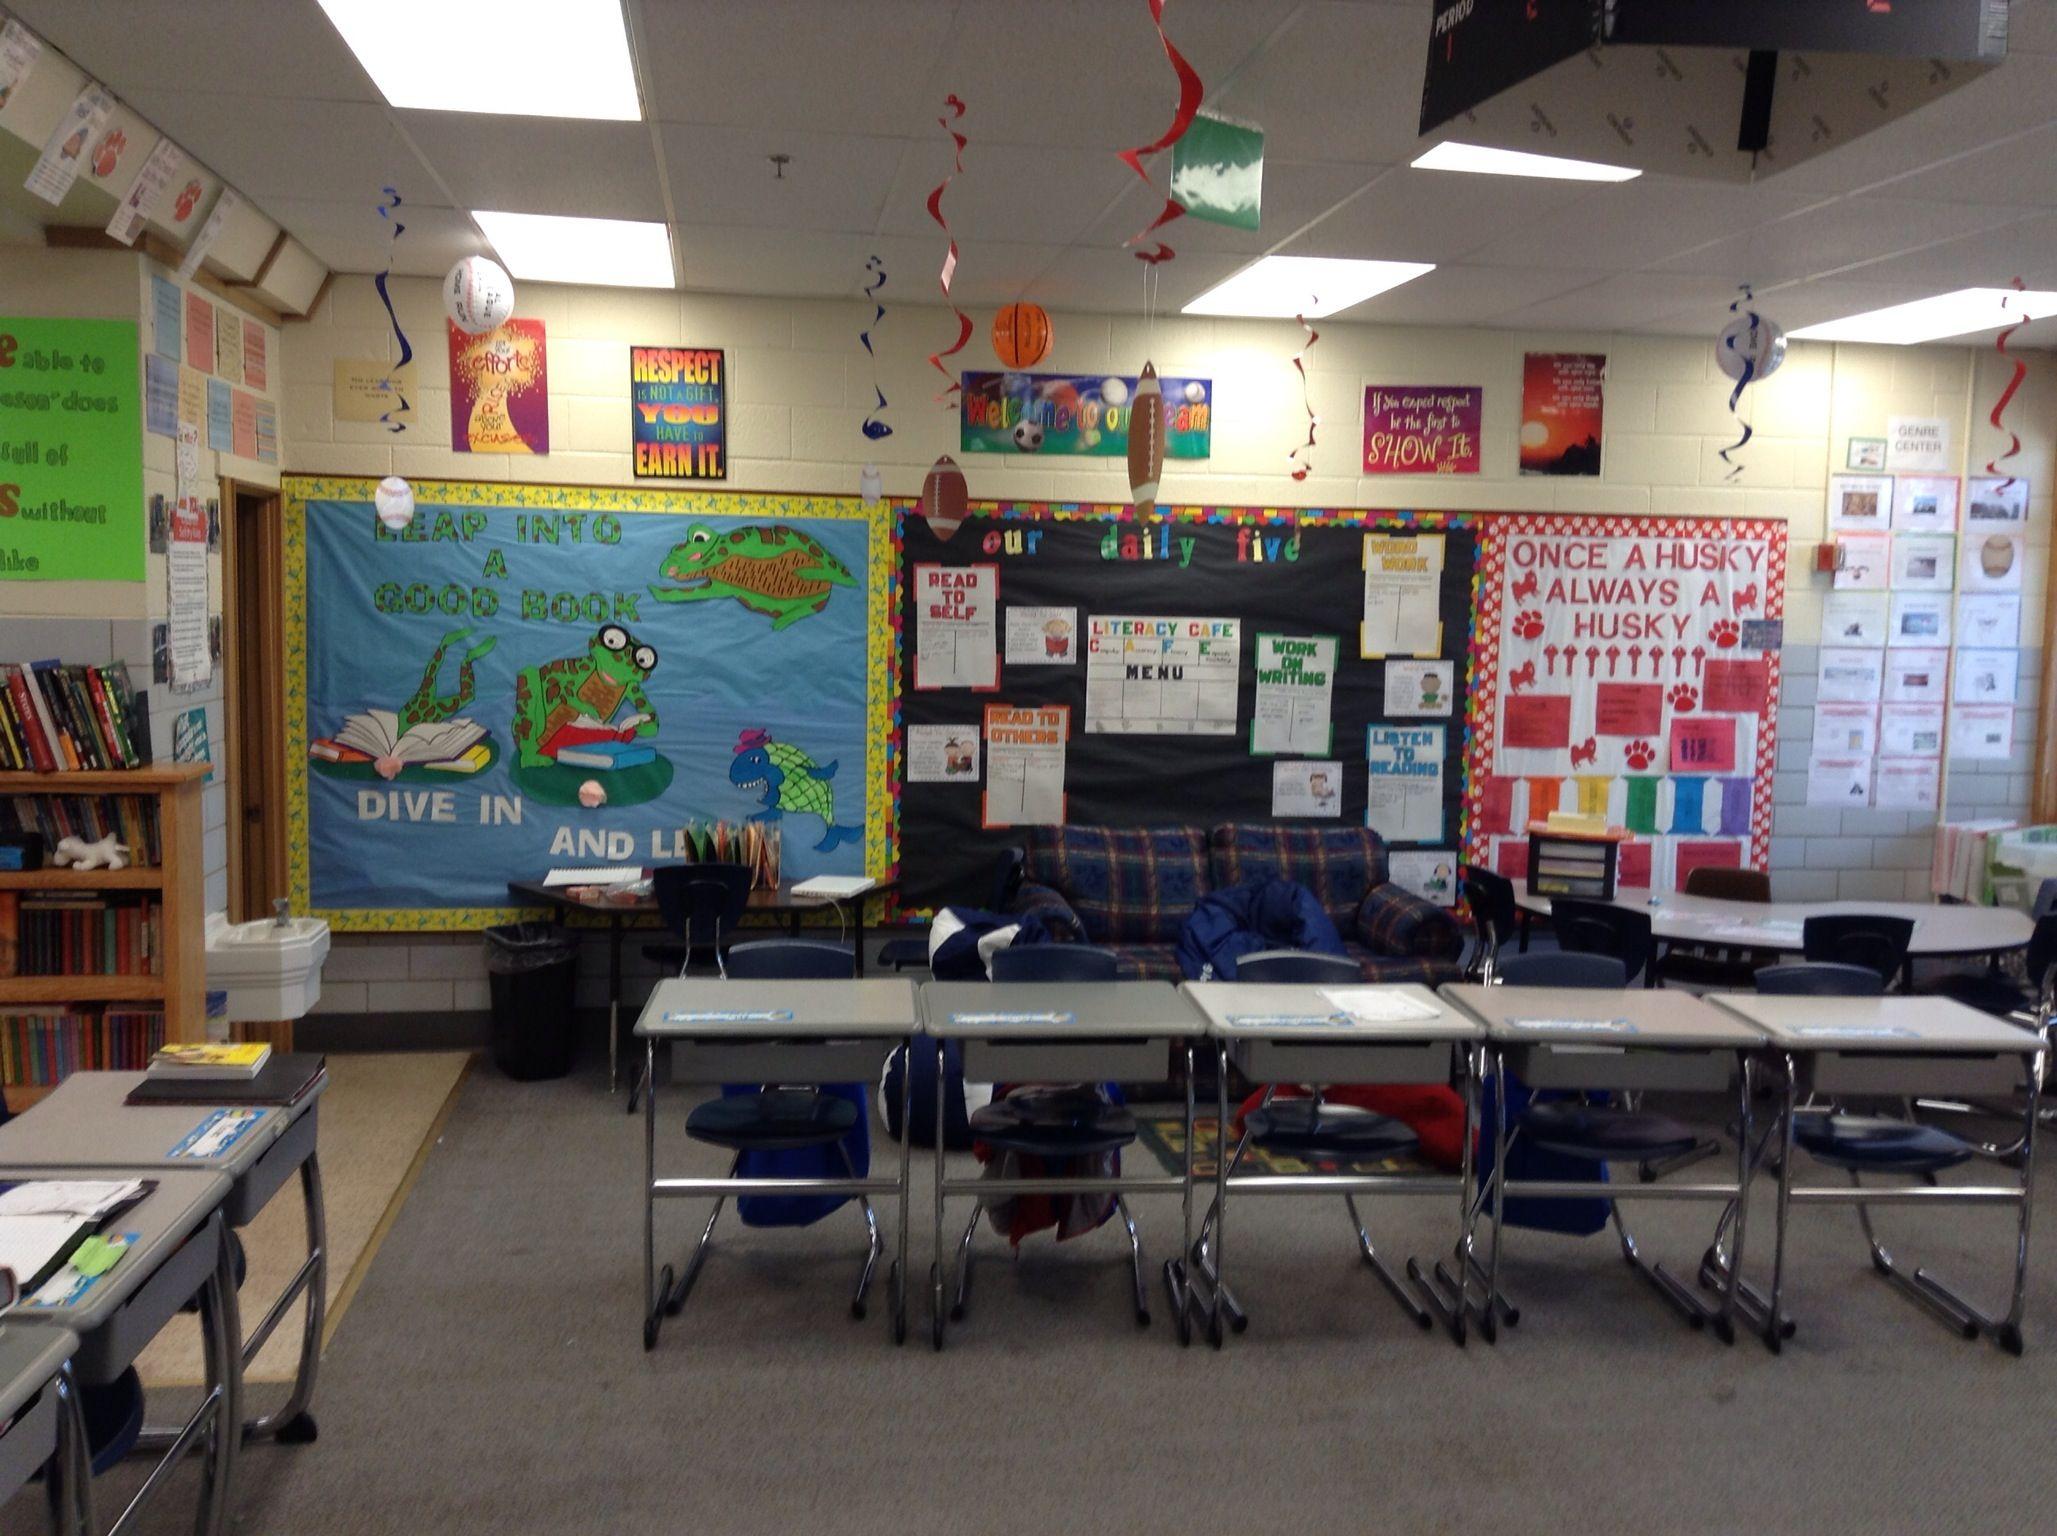 Classroom Decoration For Grade 5 : Th grade classroom decorations